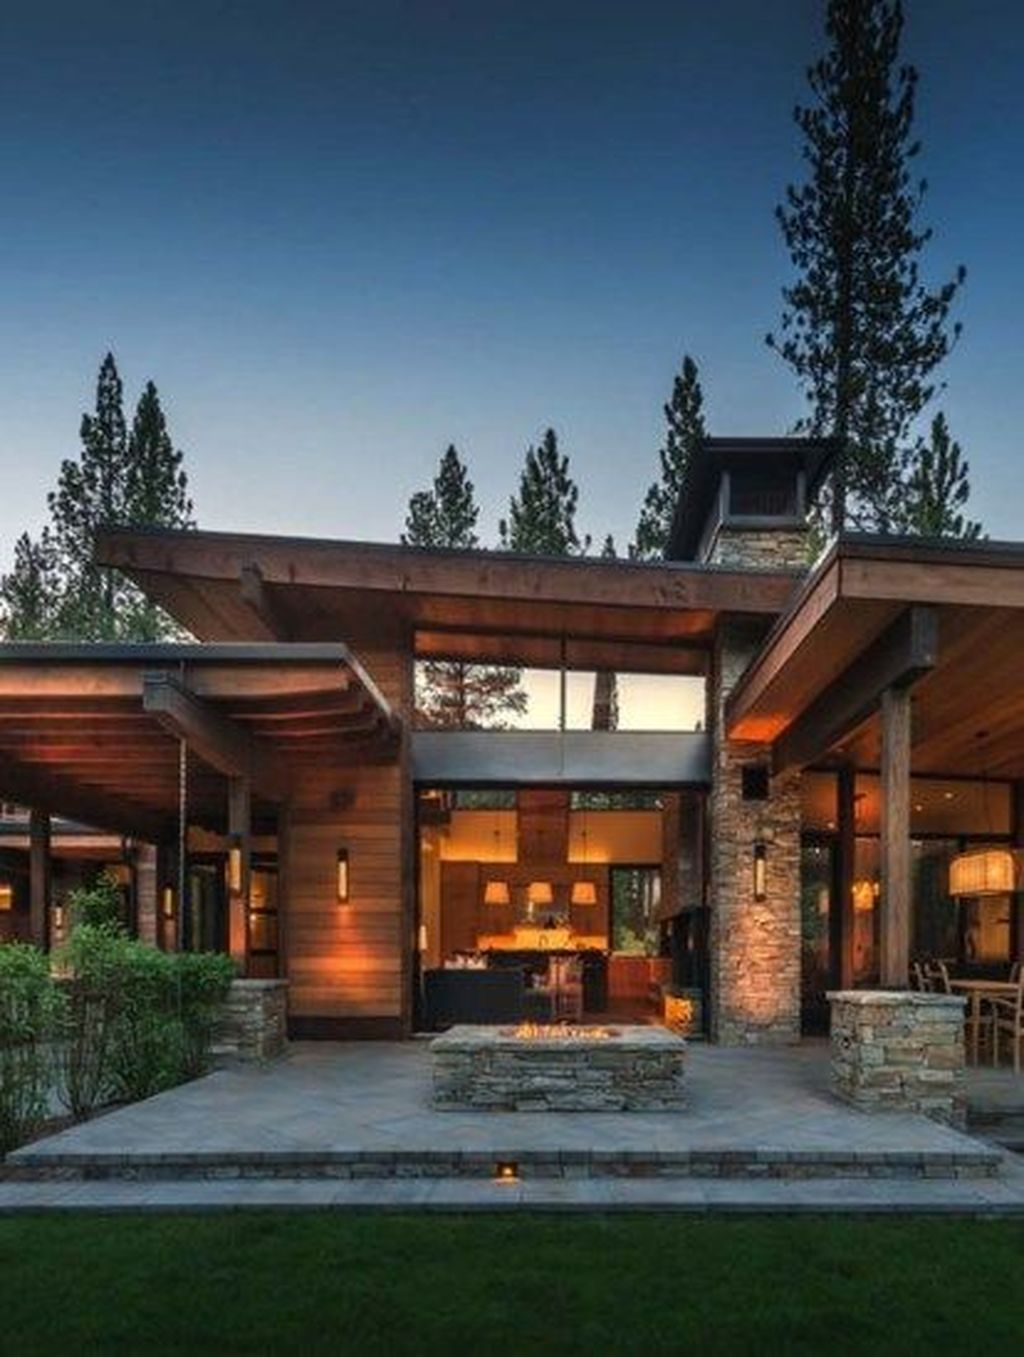 36 Lovely Modern Home Exterior Design Ideas Modern Mountain Home